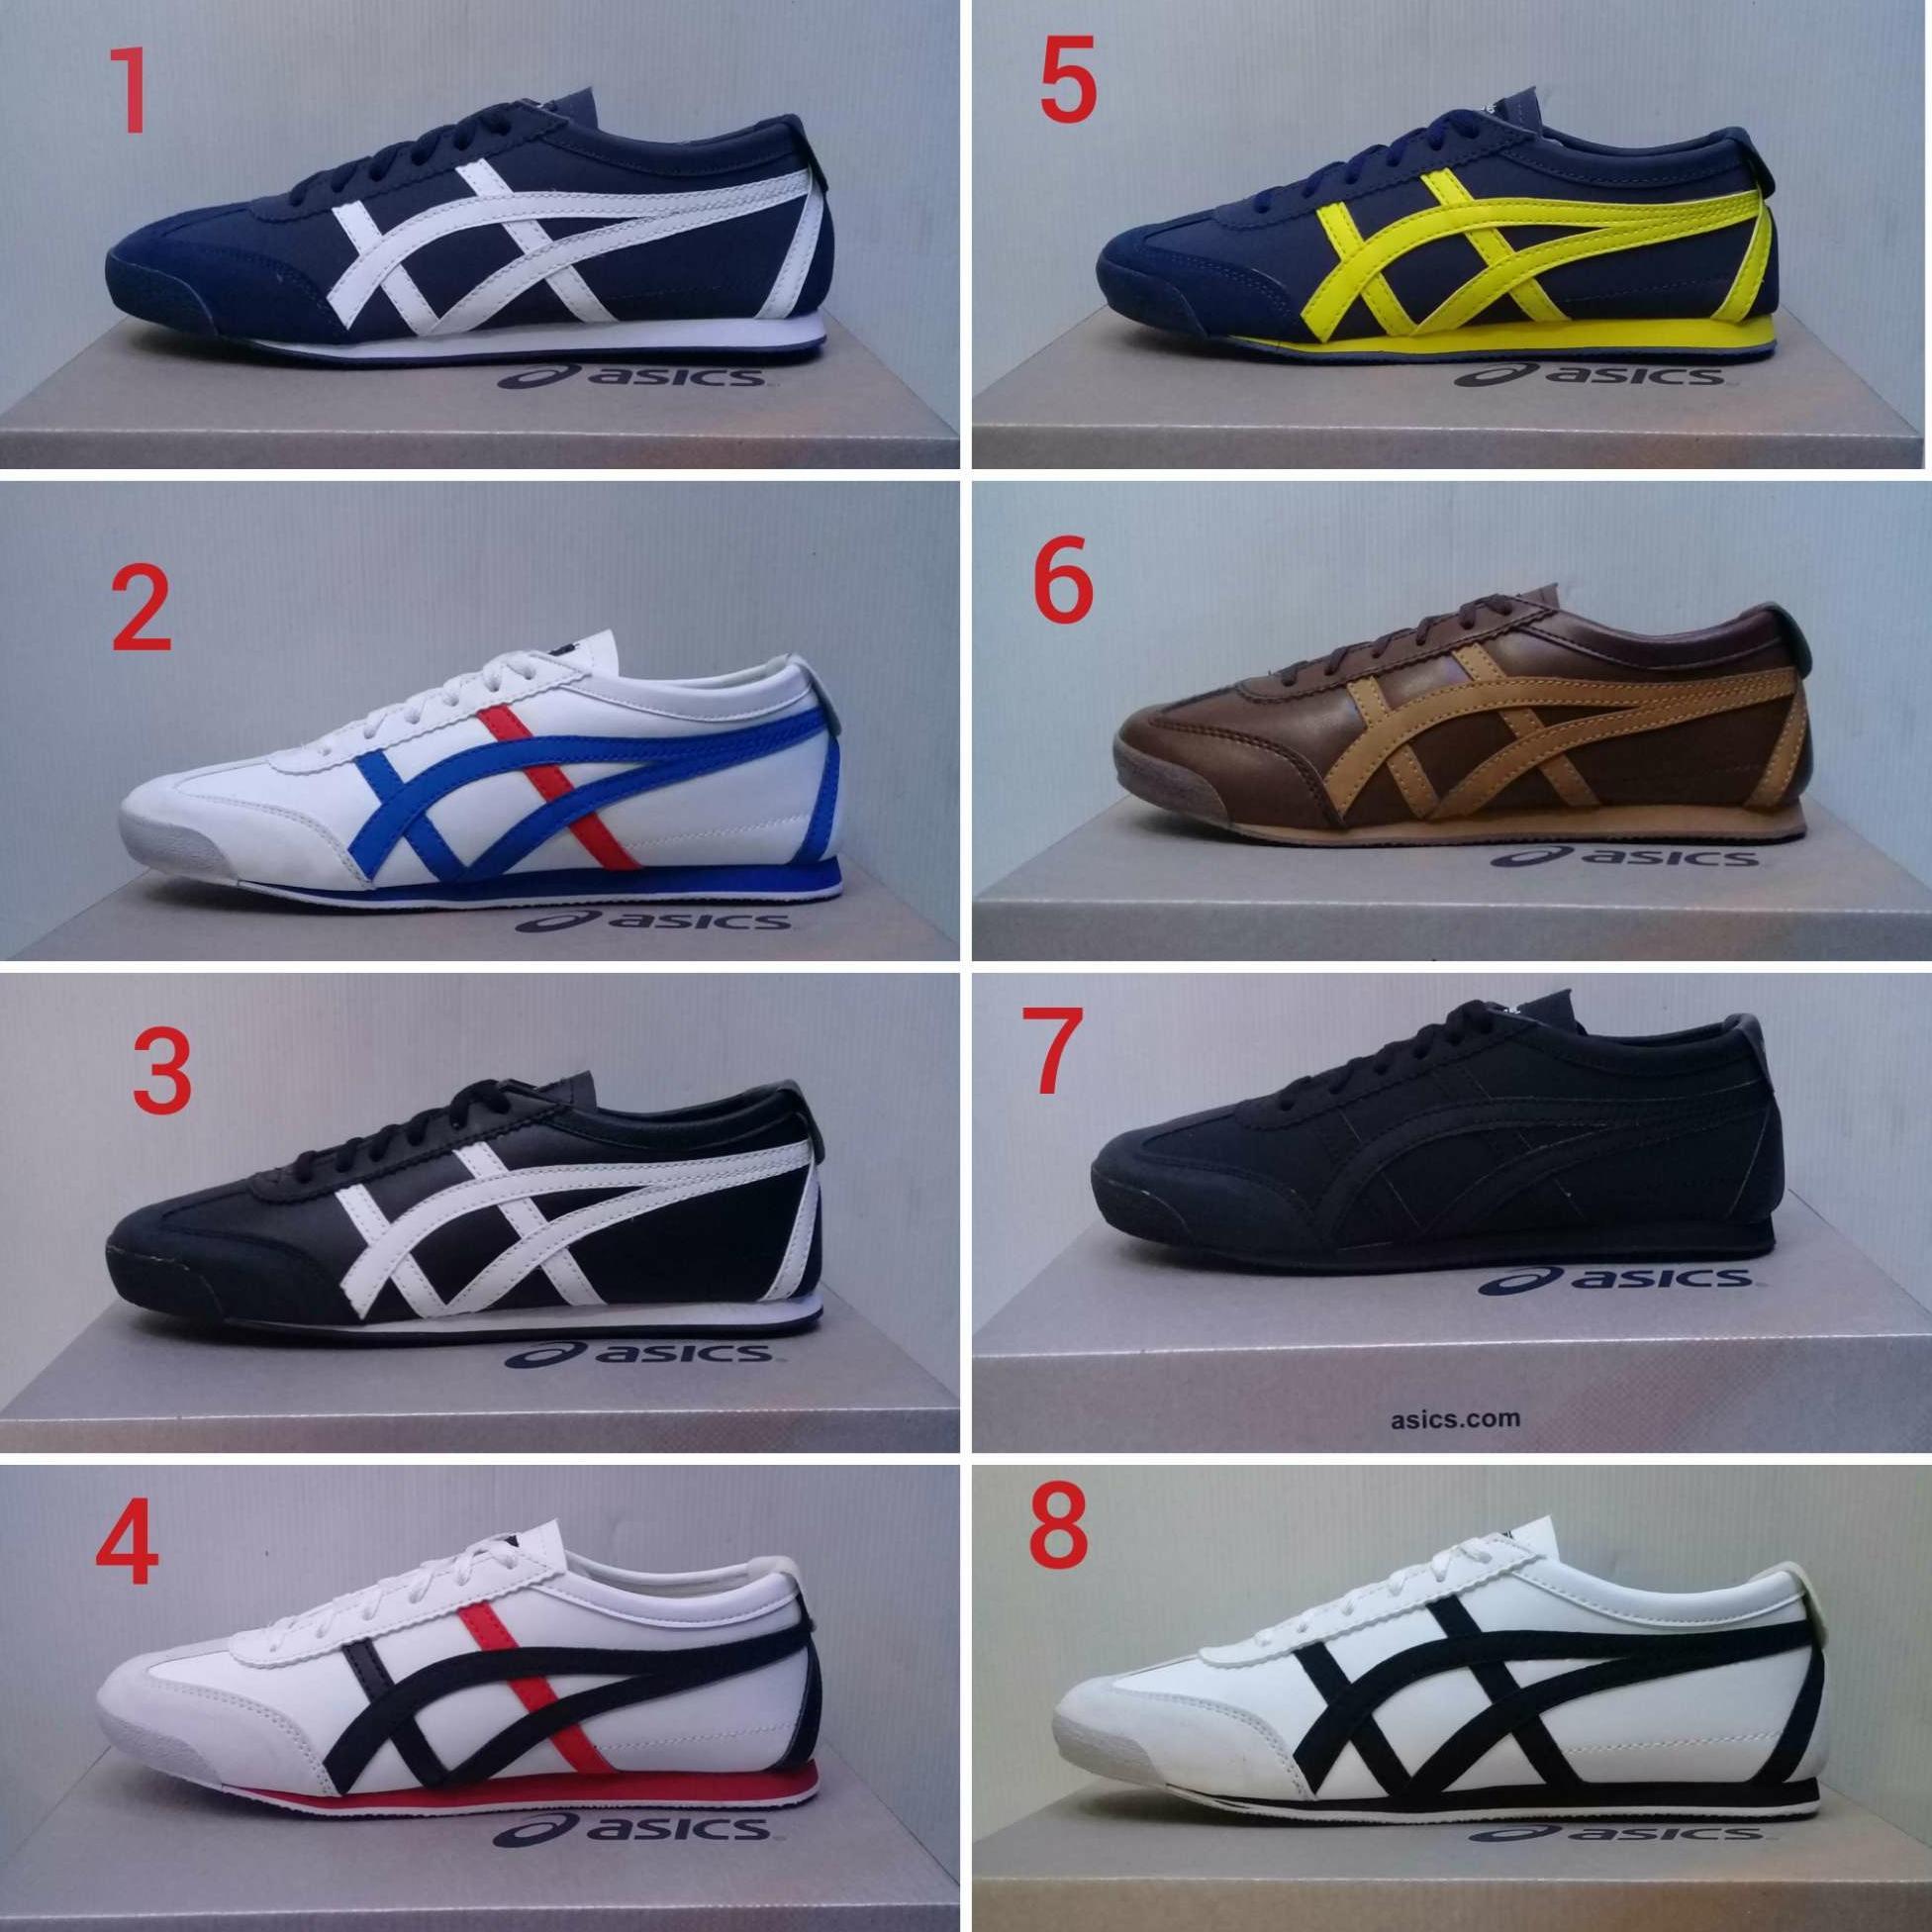 Produk Onitsuka Tiger Terbaru Sepatu Sneakers Anak Asic Spatu  Sport Olahraga Sekolah Asics